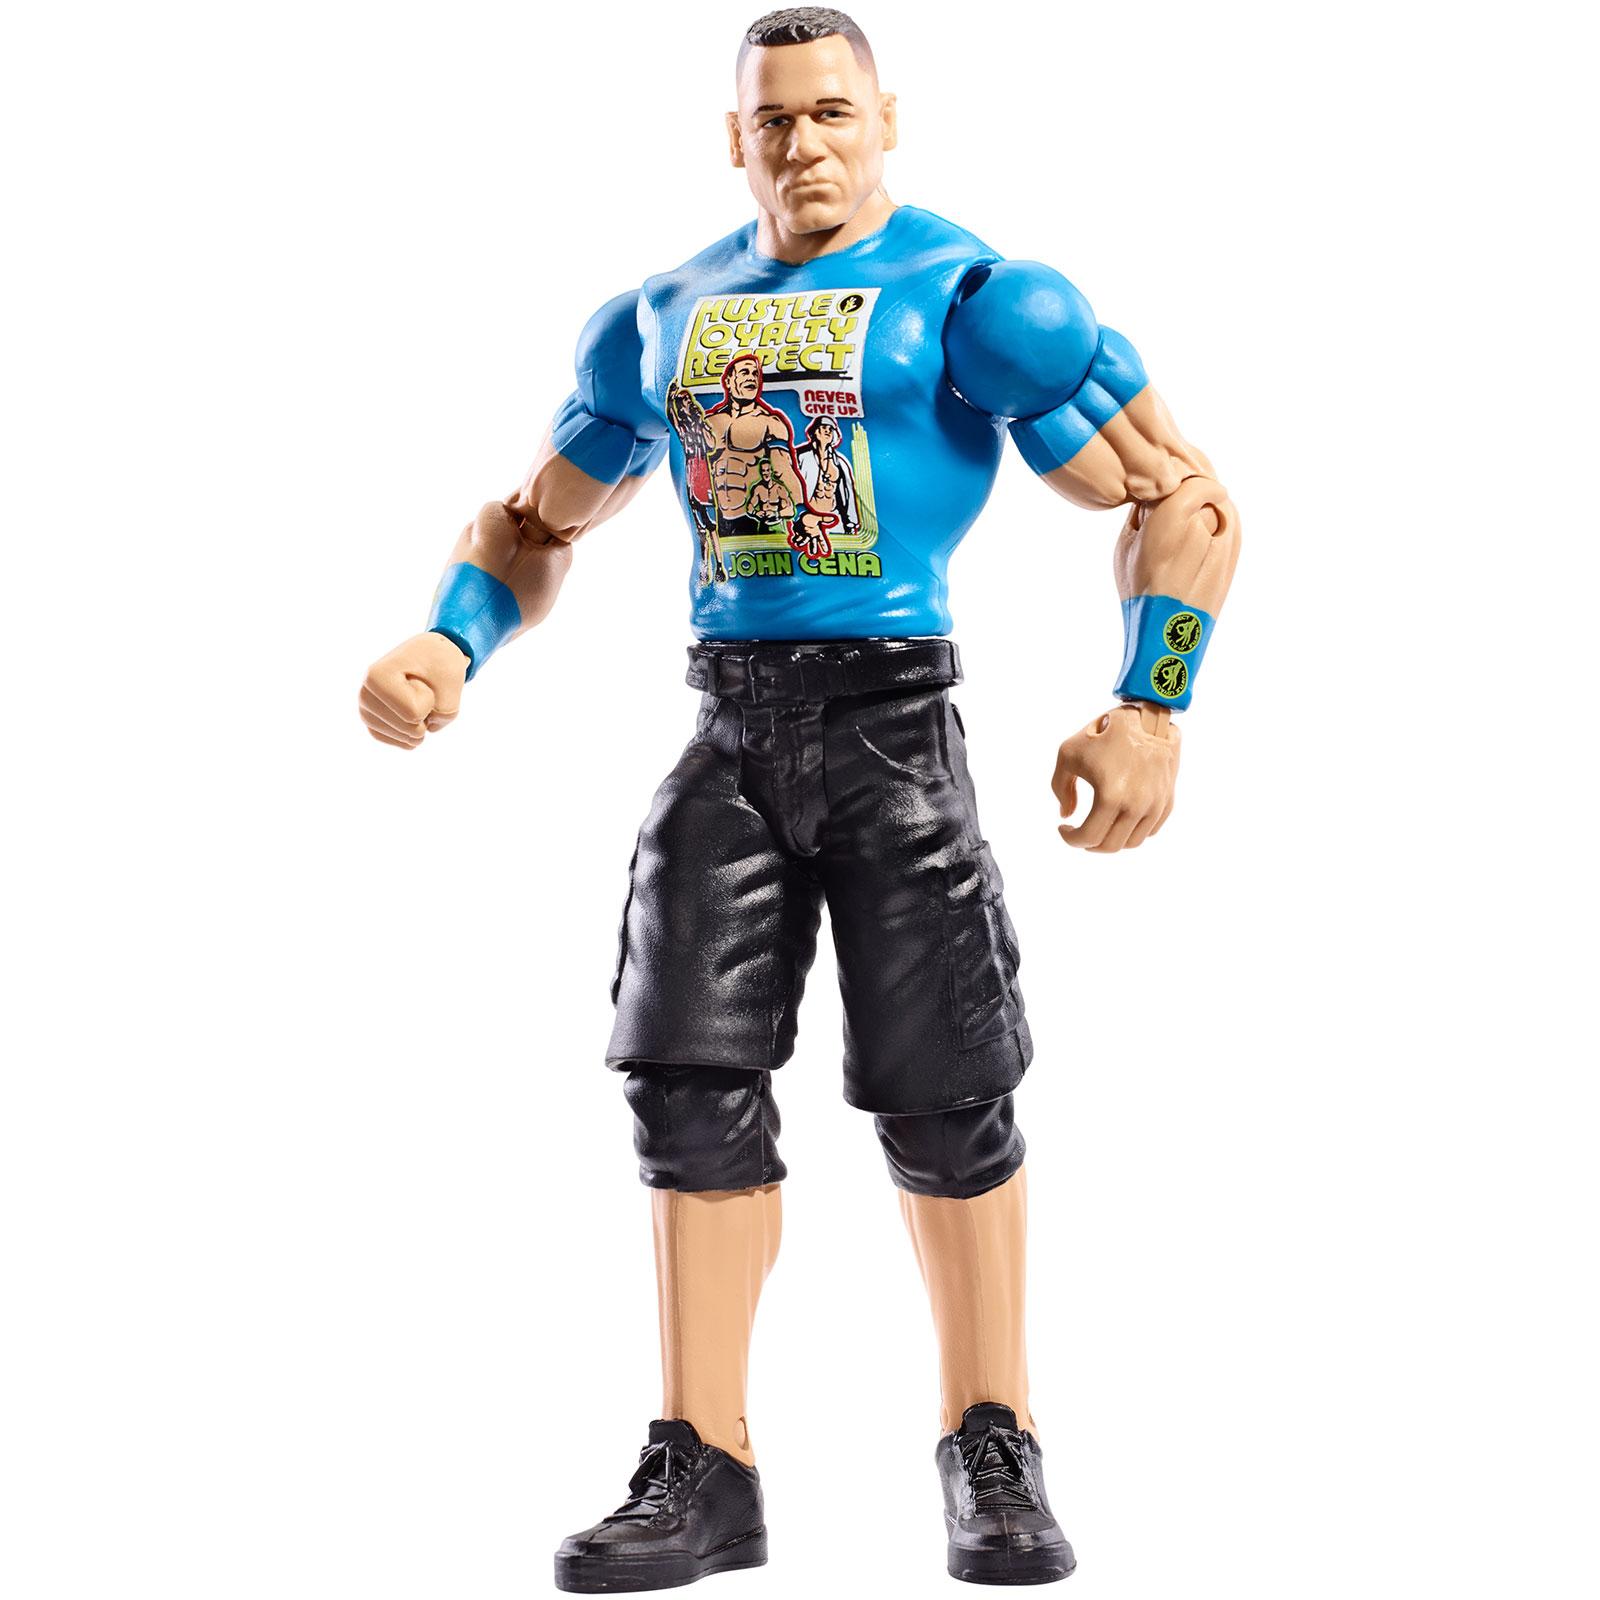 Wwe Champion Figure John Cena - Kmart Exclusive